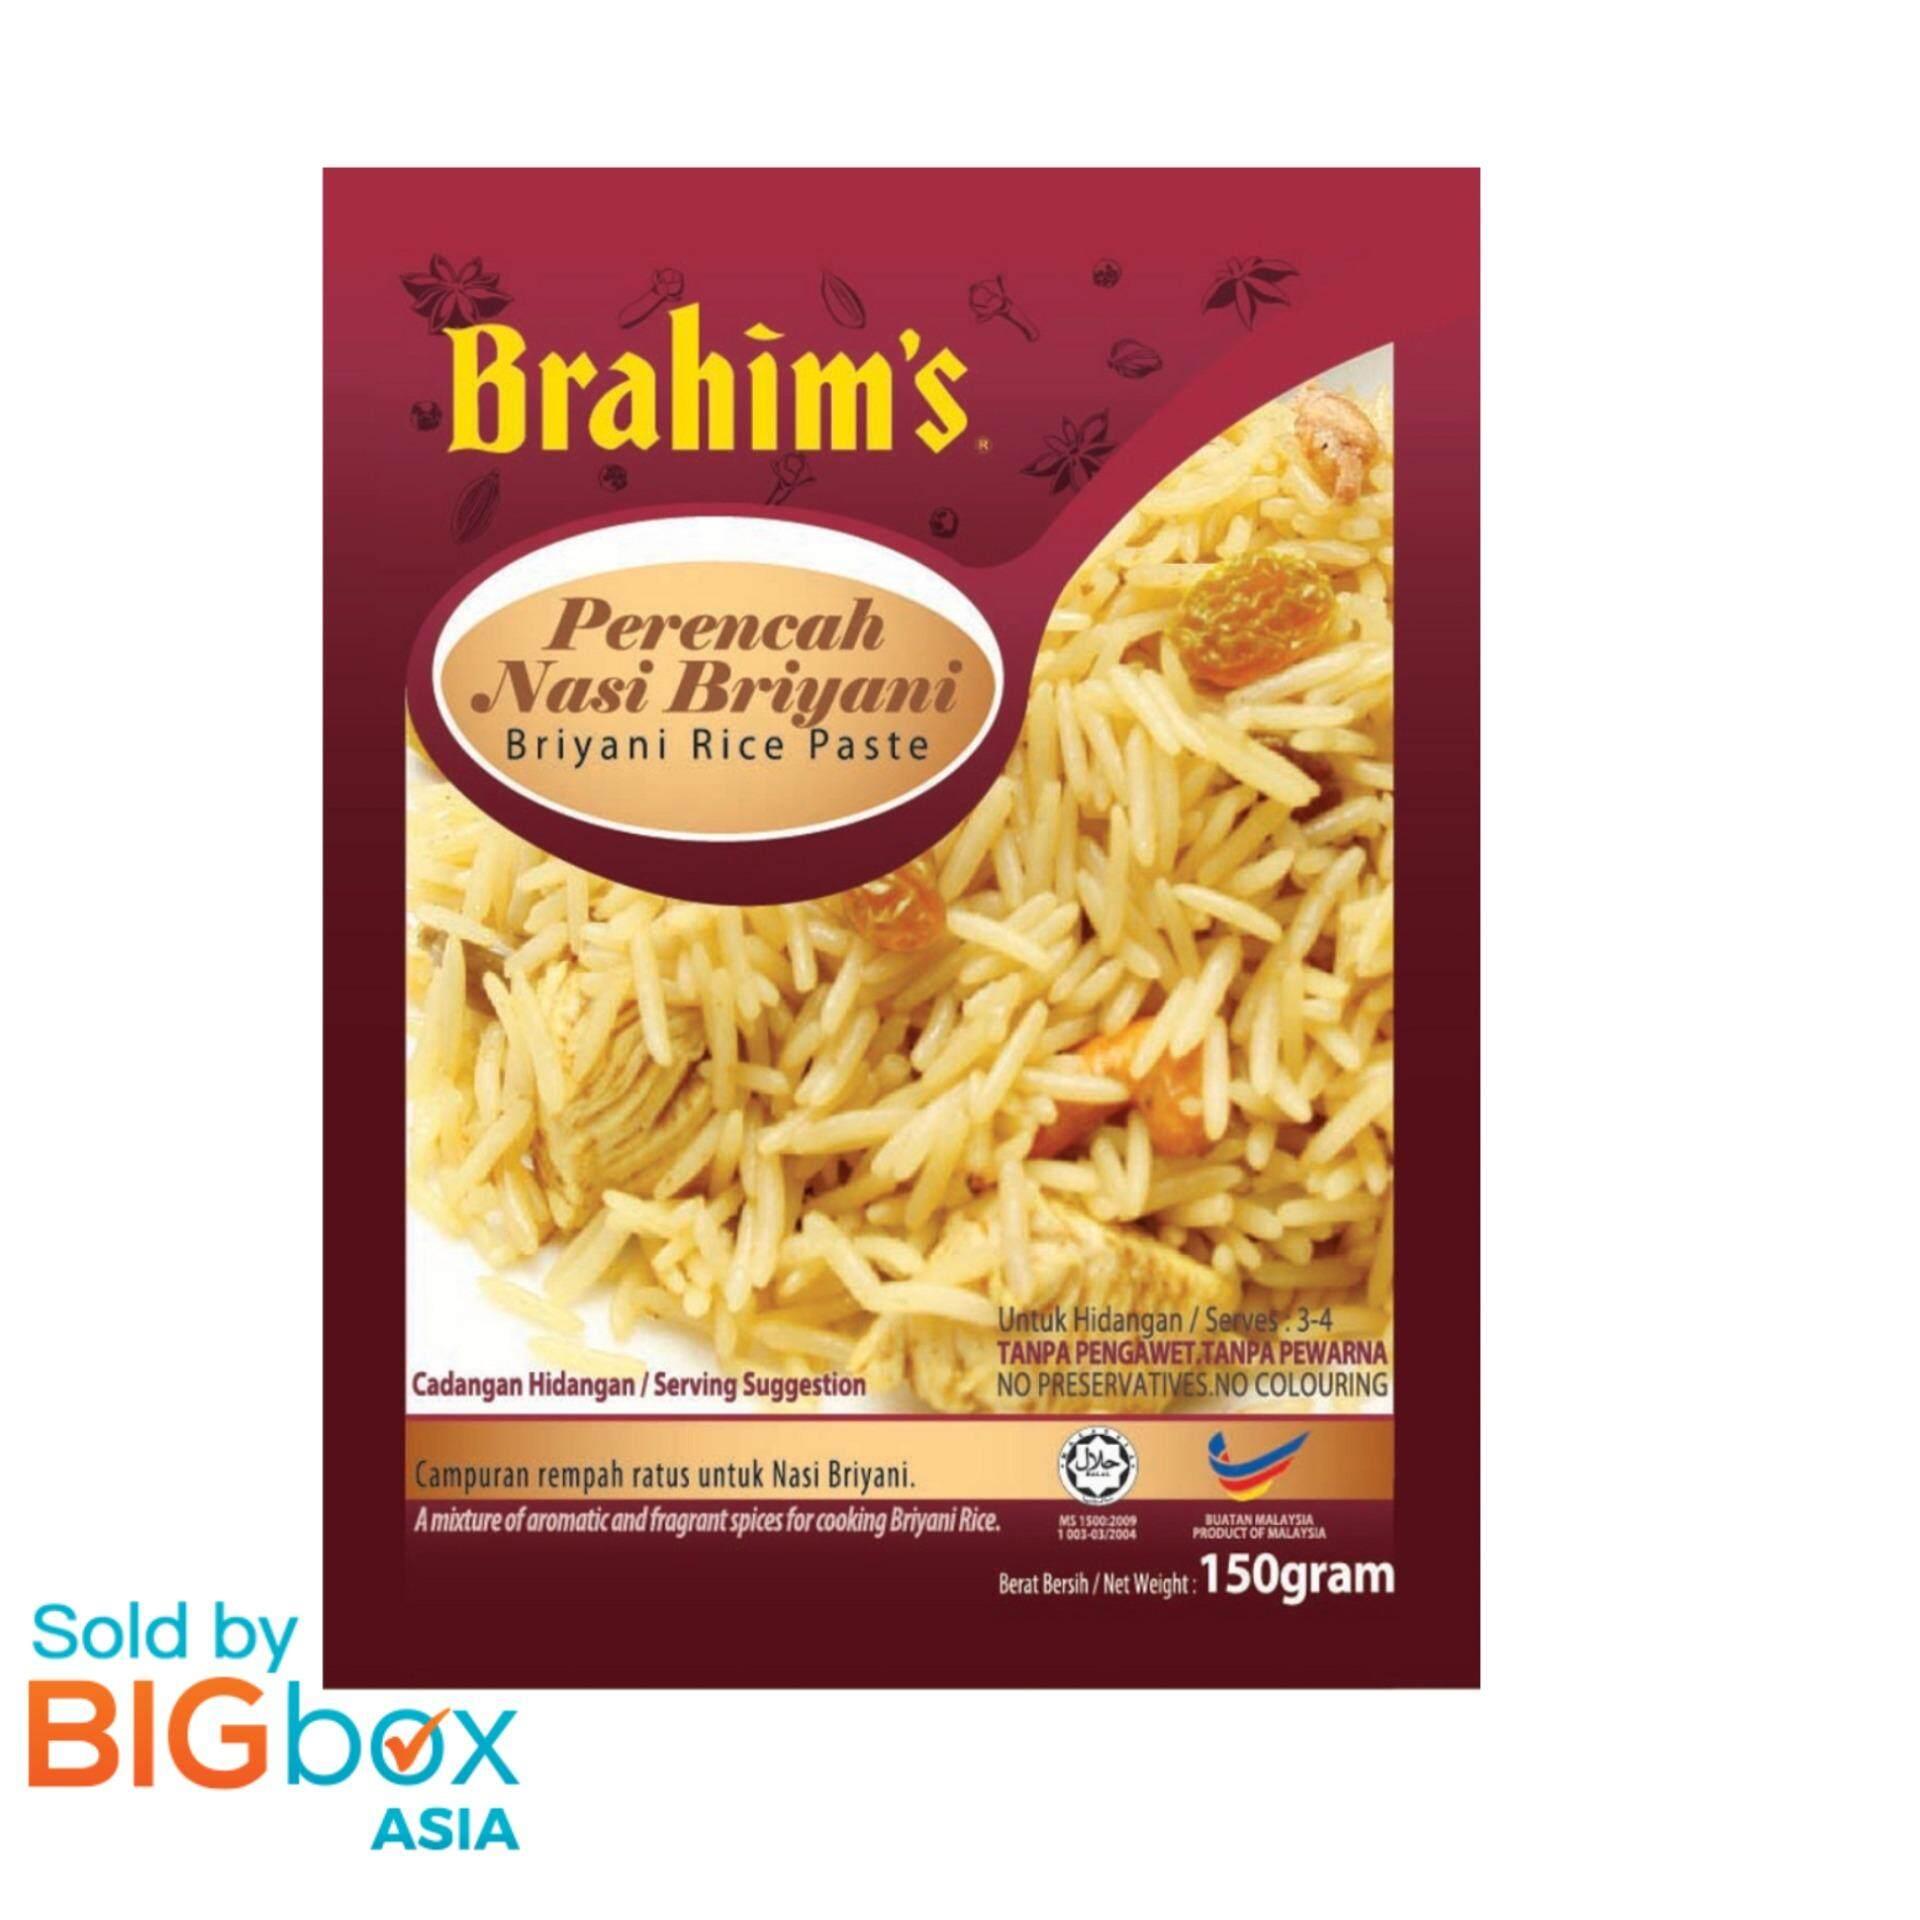 [BIGBox Asia] Brahims Ready To Use Briyani Rice Paste 150g - Malaysia